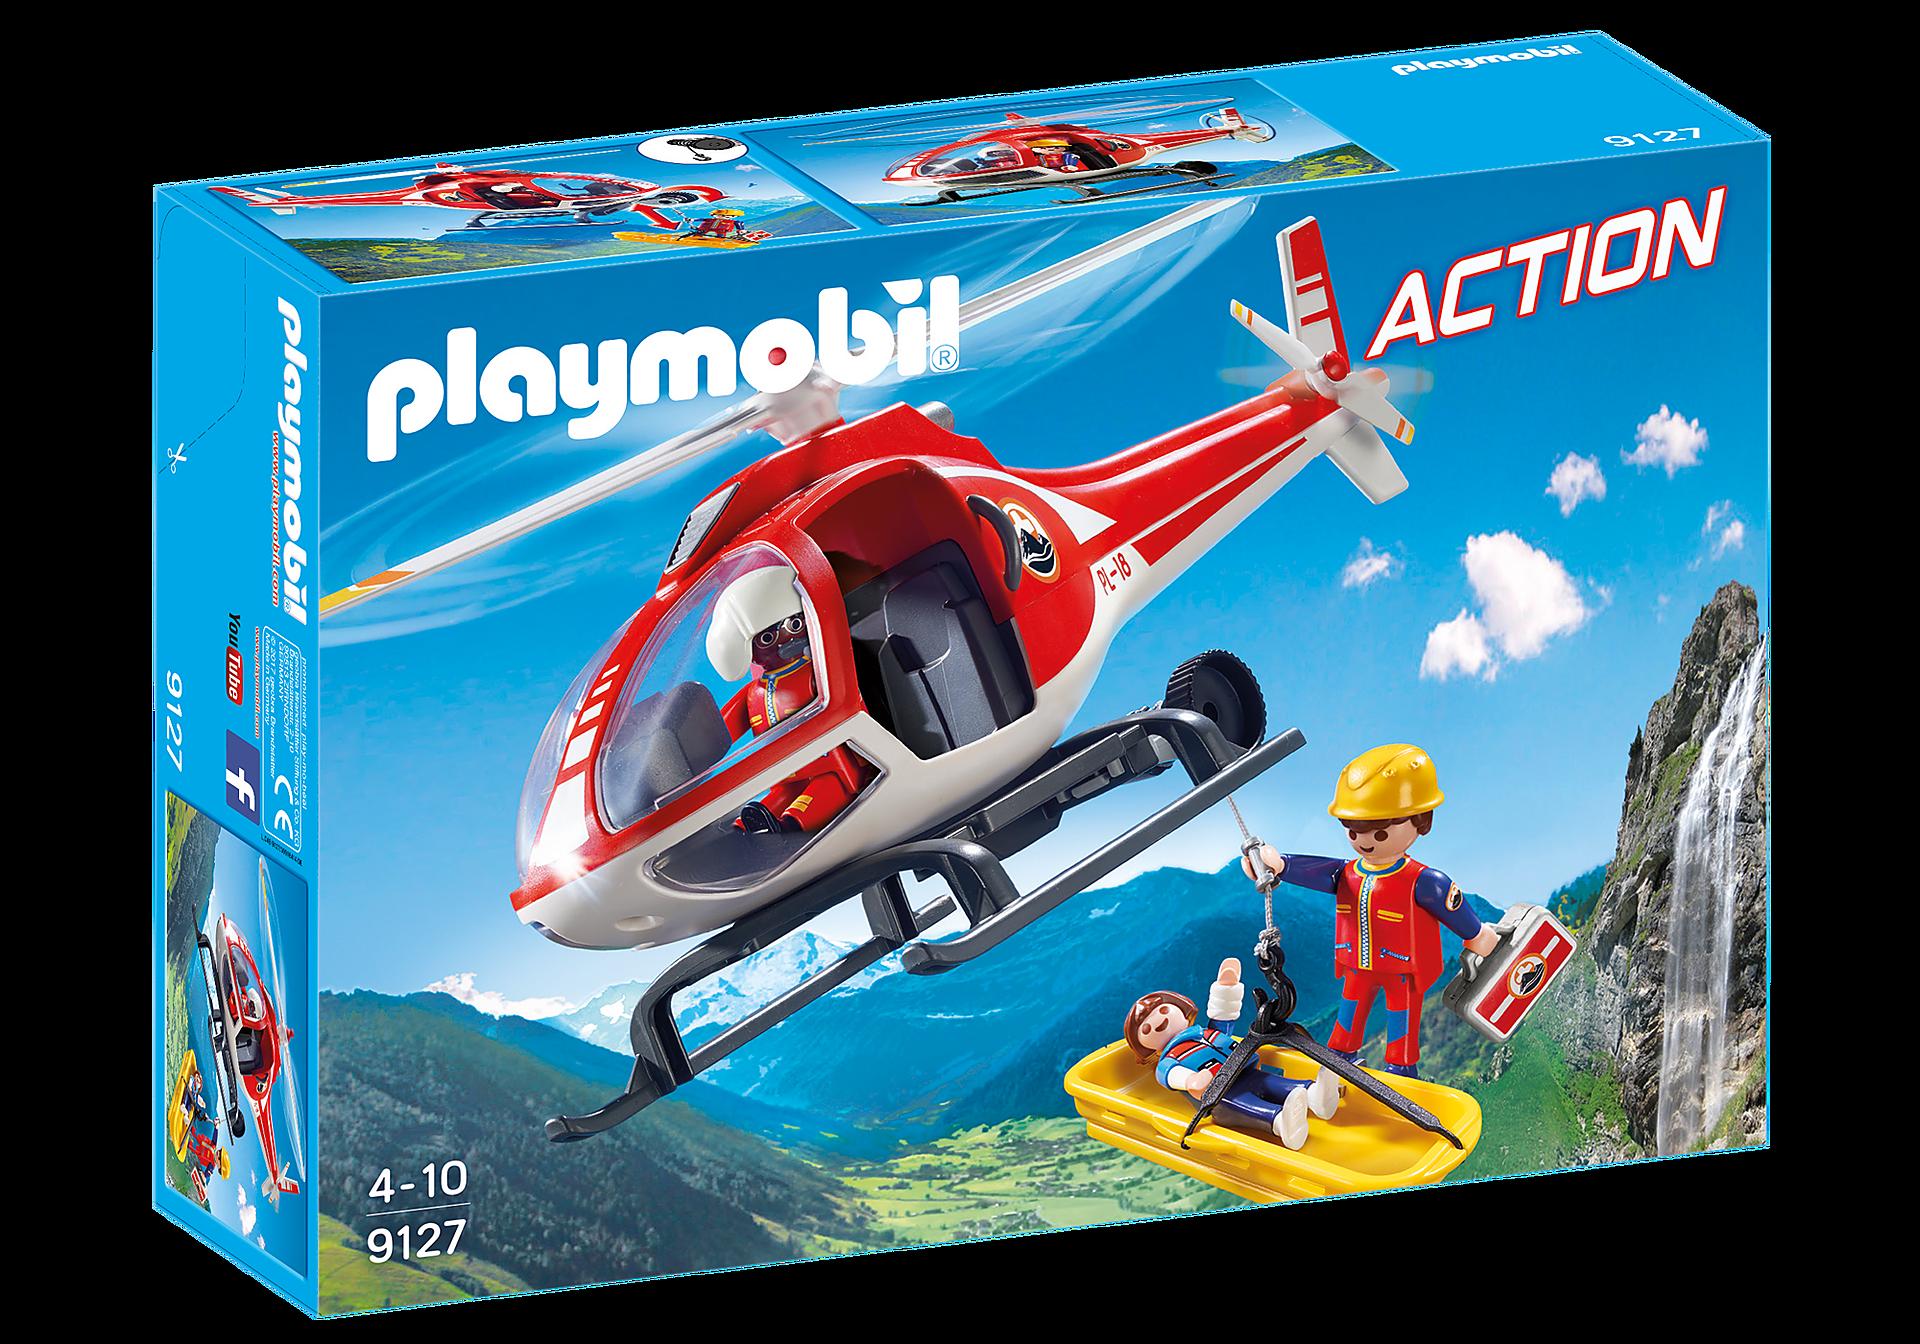 http://media.playmobil.com/i/playmobil/9127_product_box_front/Secouristes des montagnes avec hélicoptère